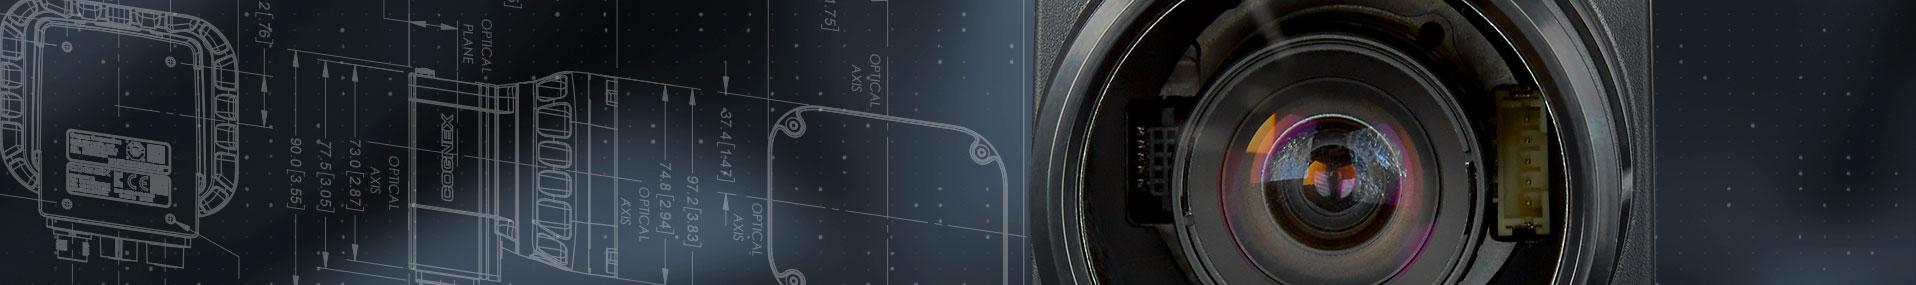 Cognex Machine Vision lens over insight blueprint